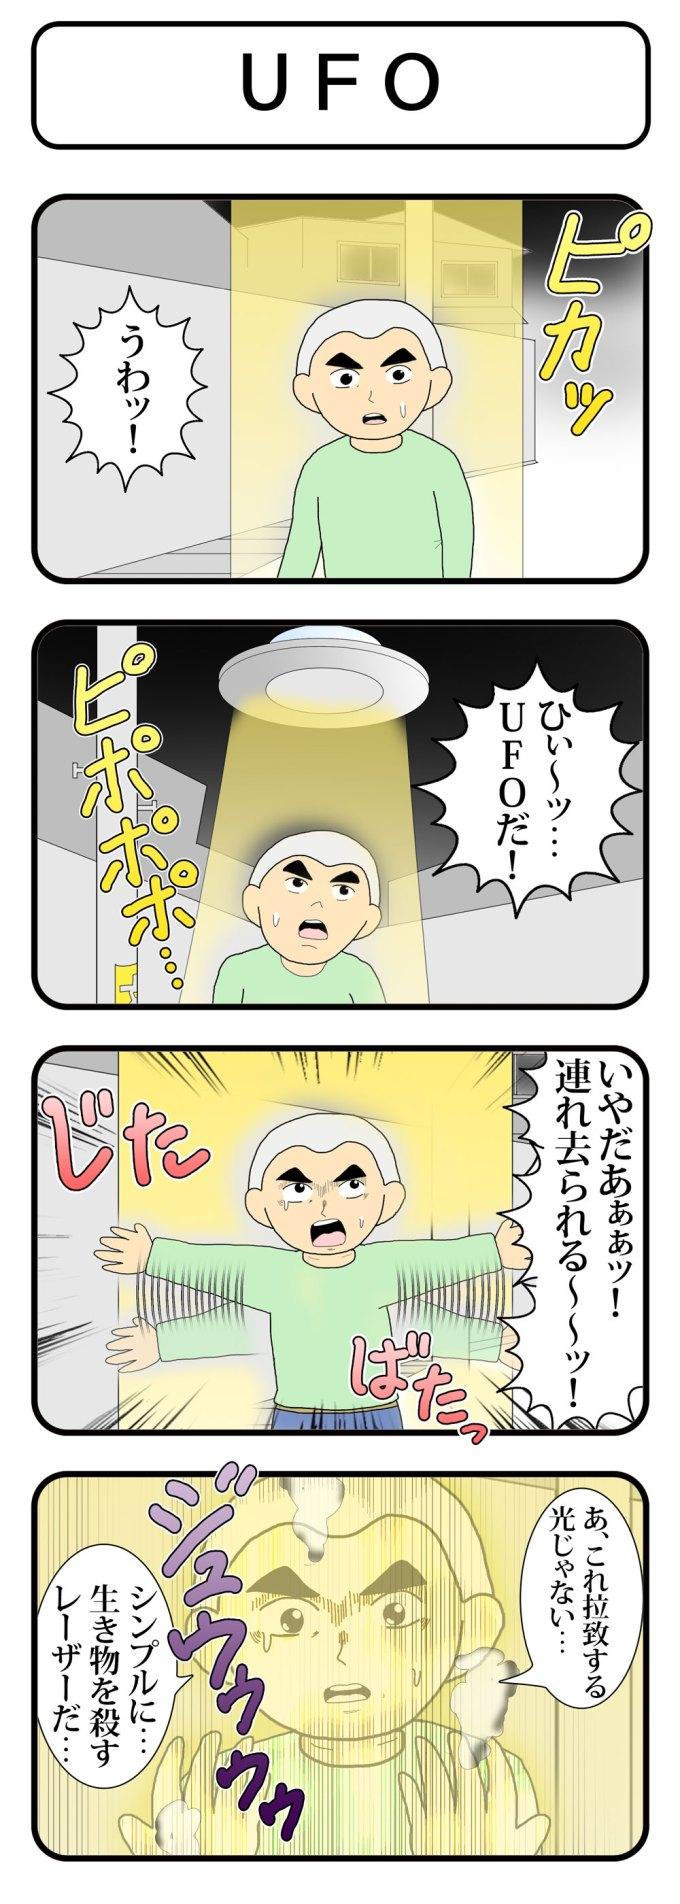 ③UFOc2